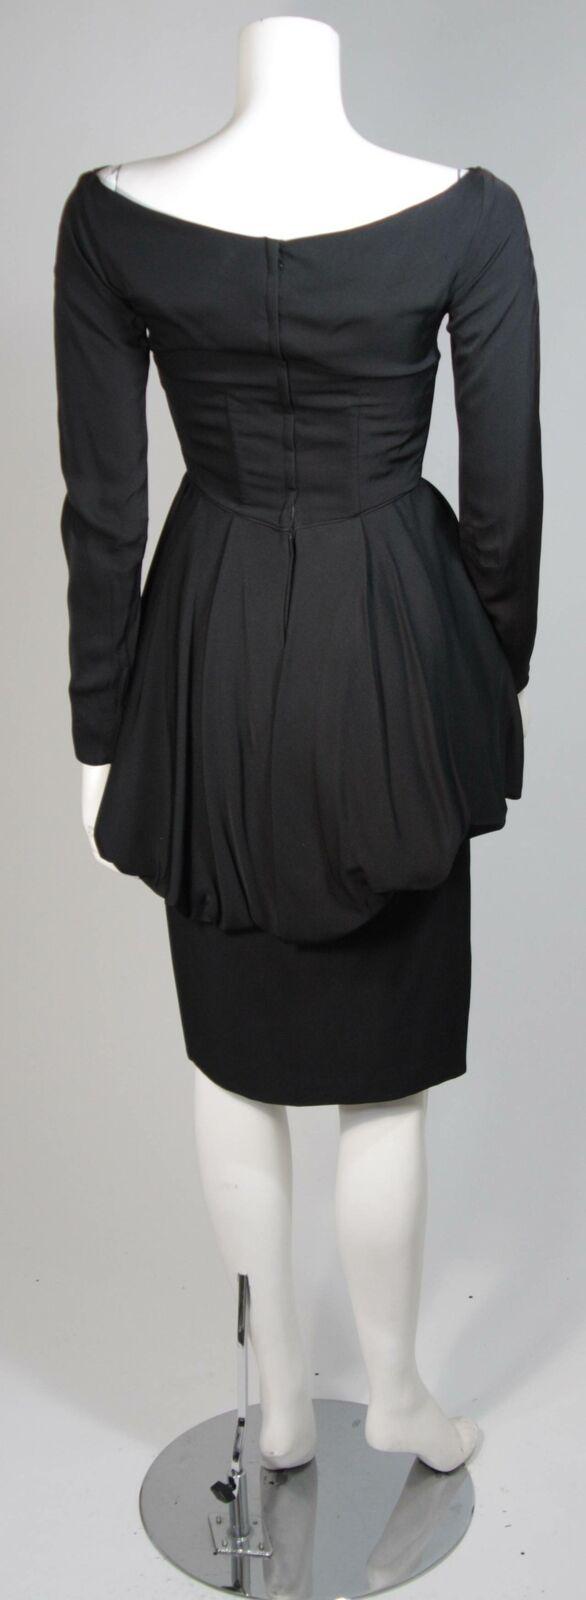 CEIL CHAPMAN Black Draped Princess Style Waist Dr… - image 5